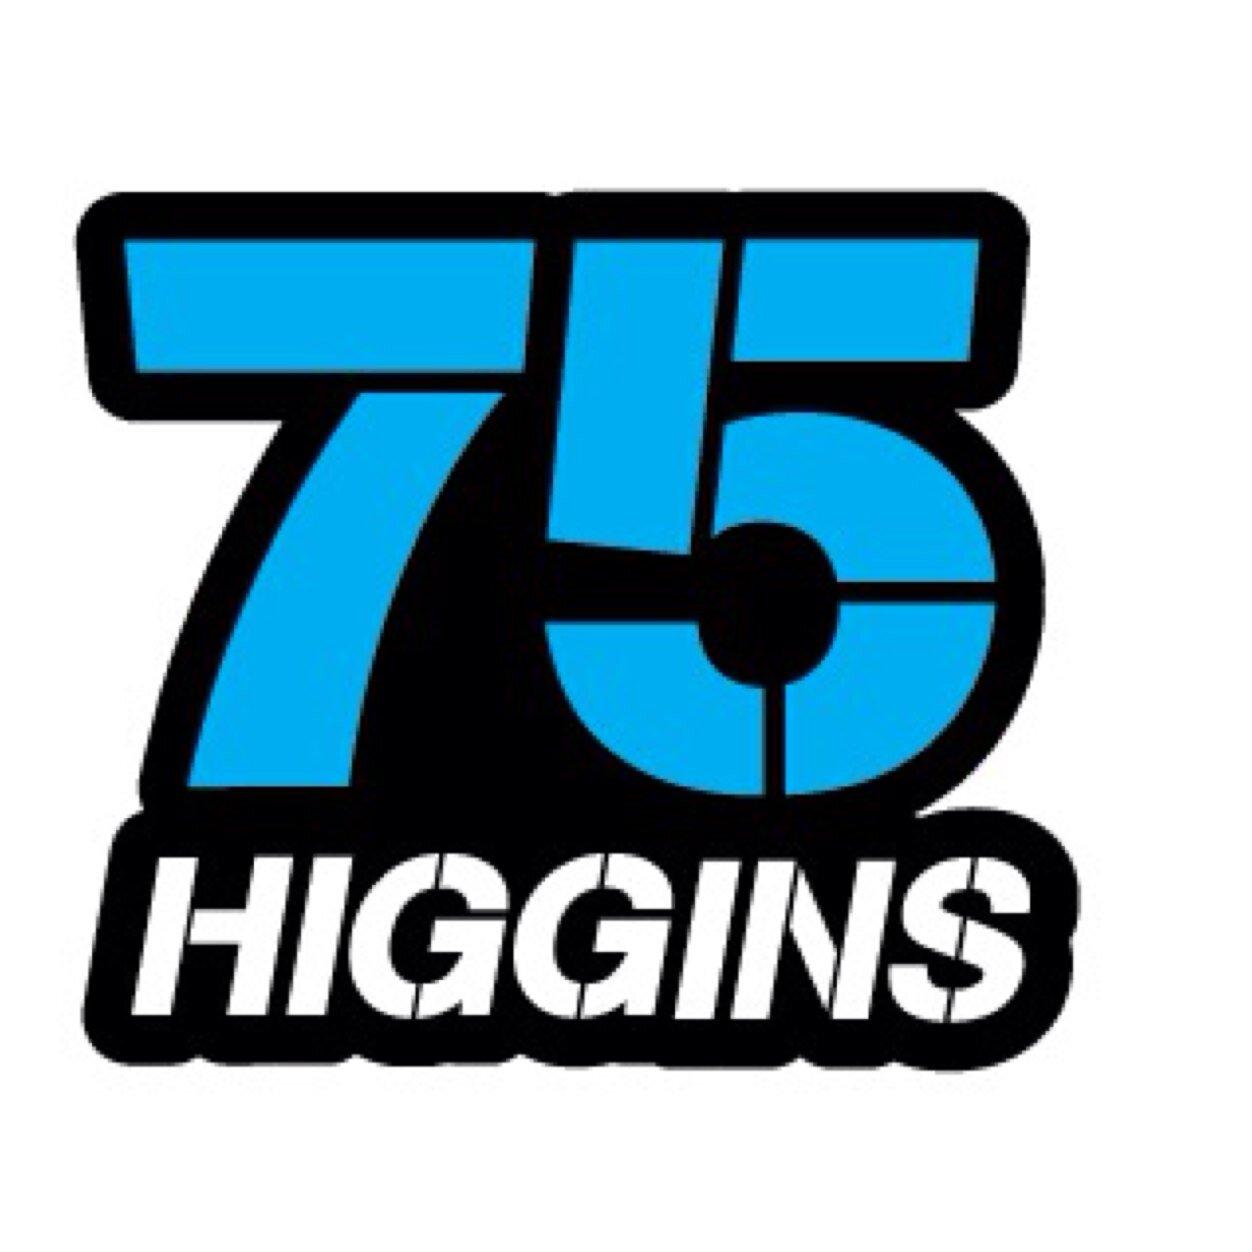 David higgins Social Profile